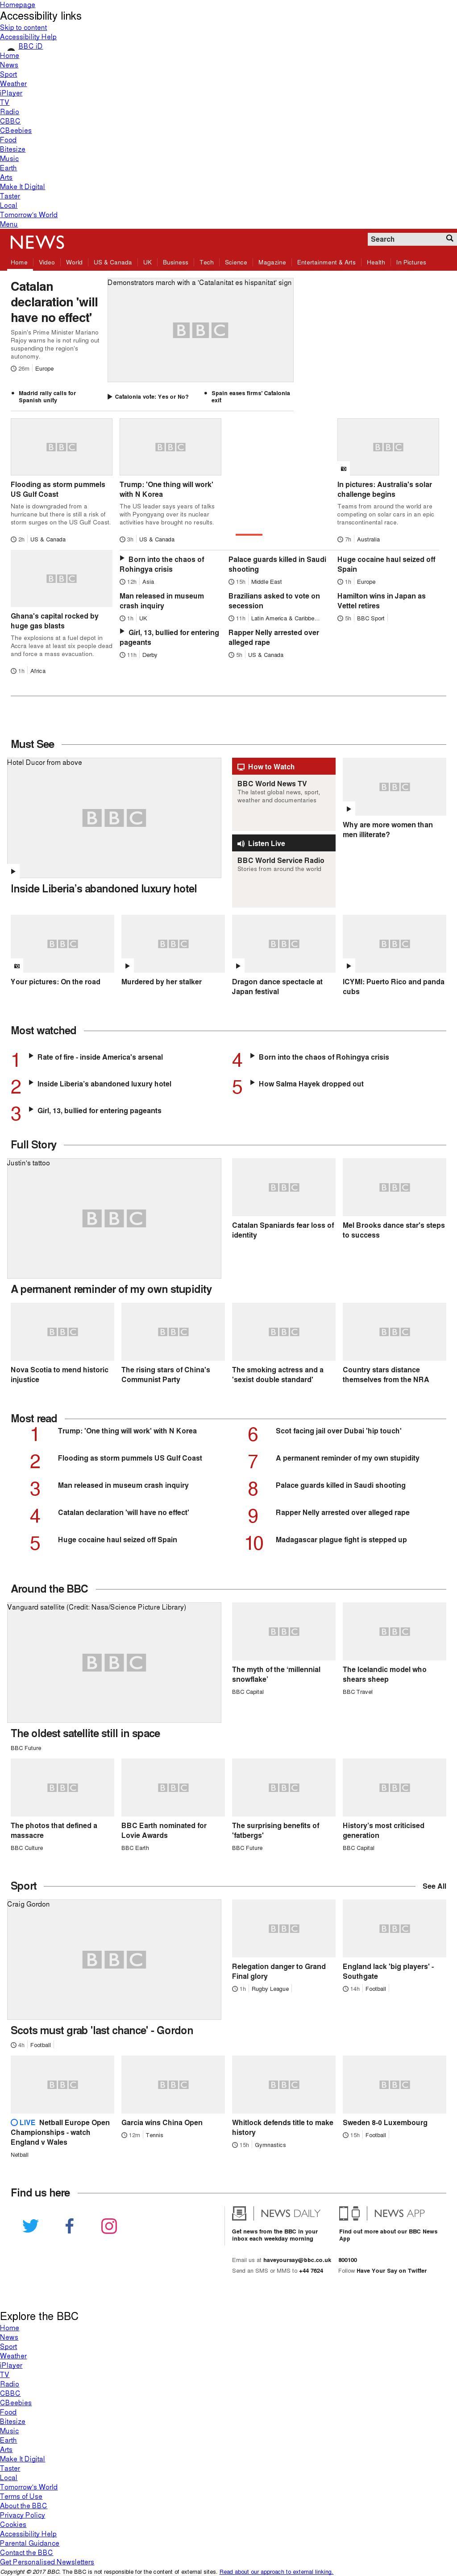 BBC at Sunday Oct. 8, 2017, noon UTC